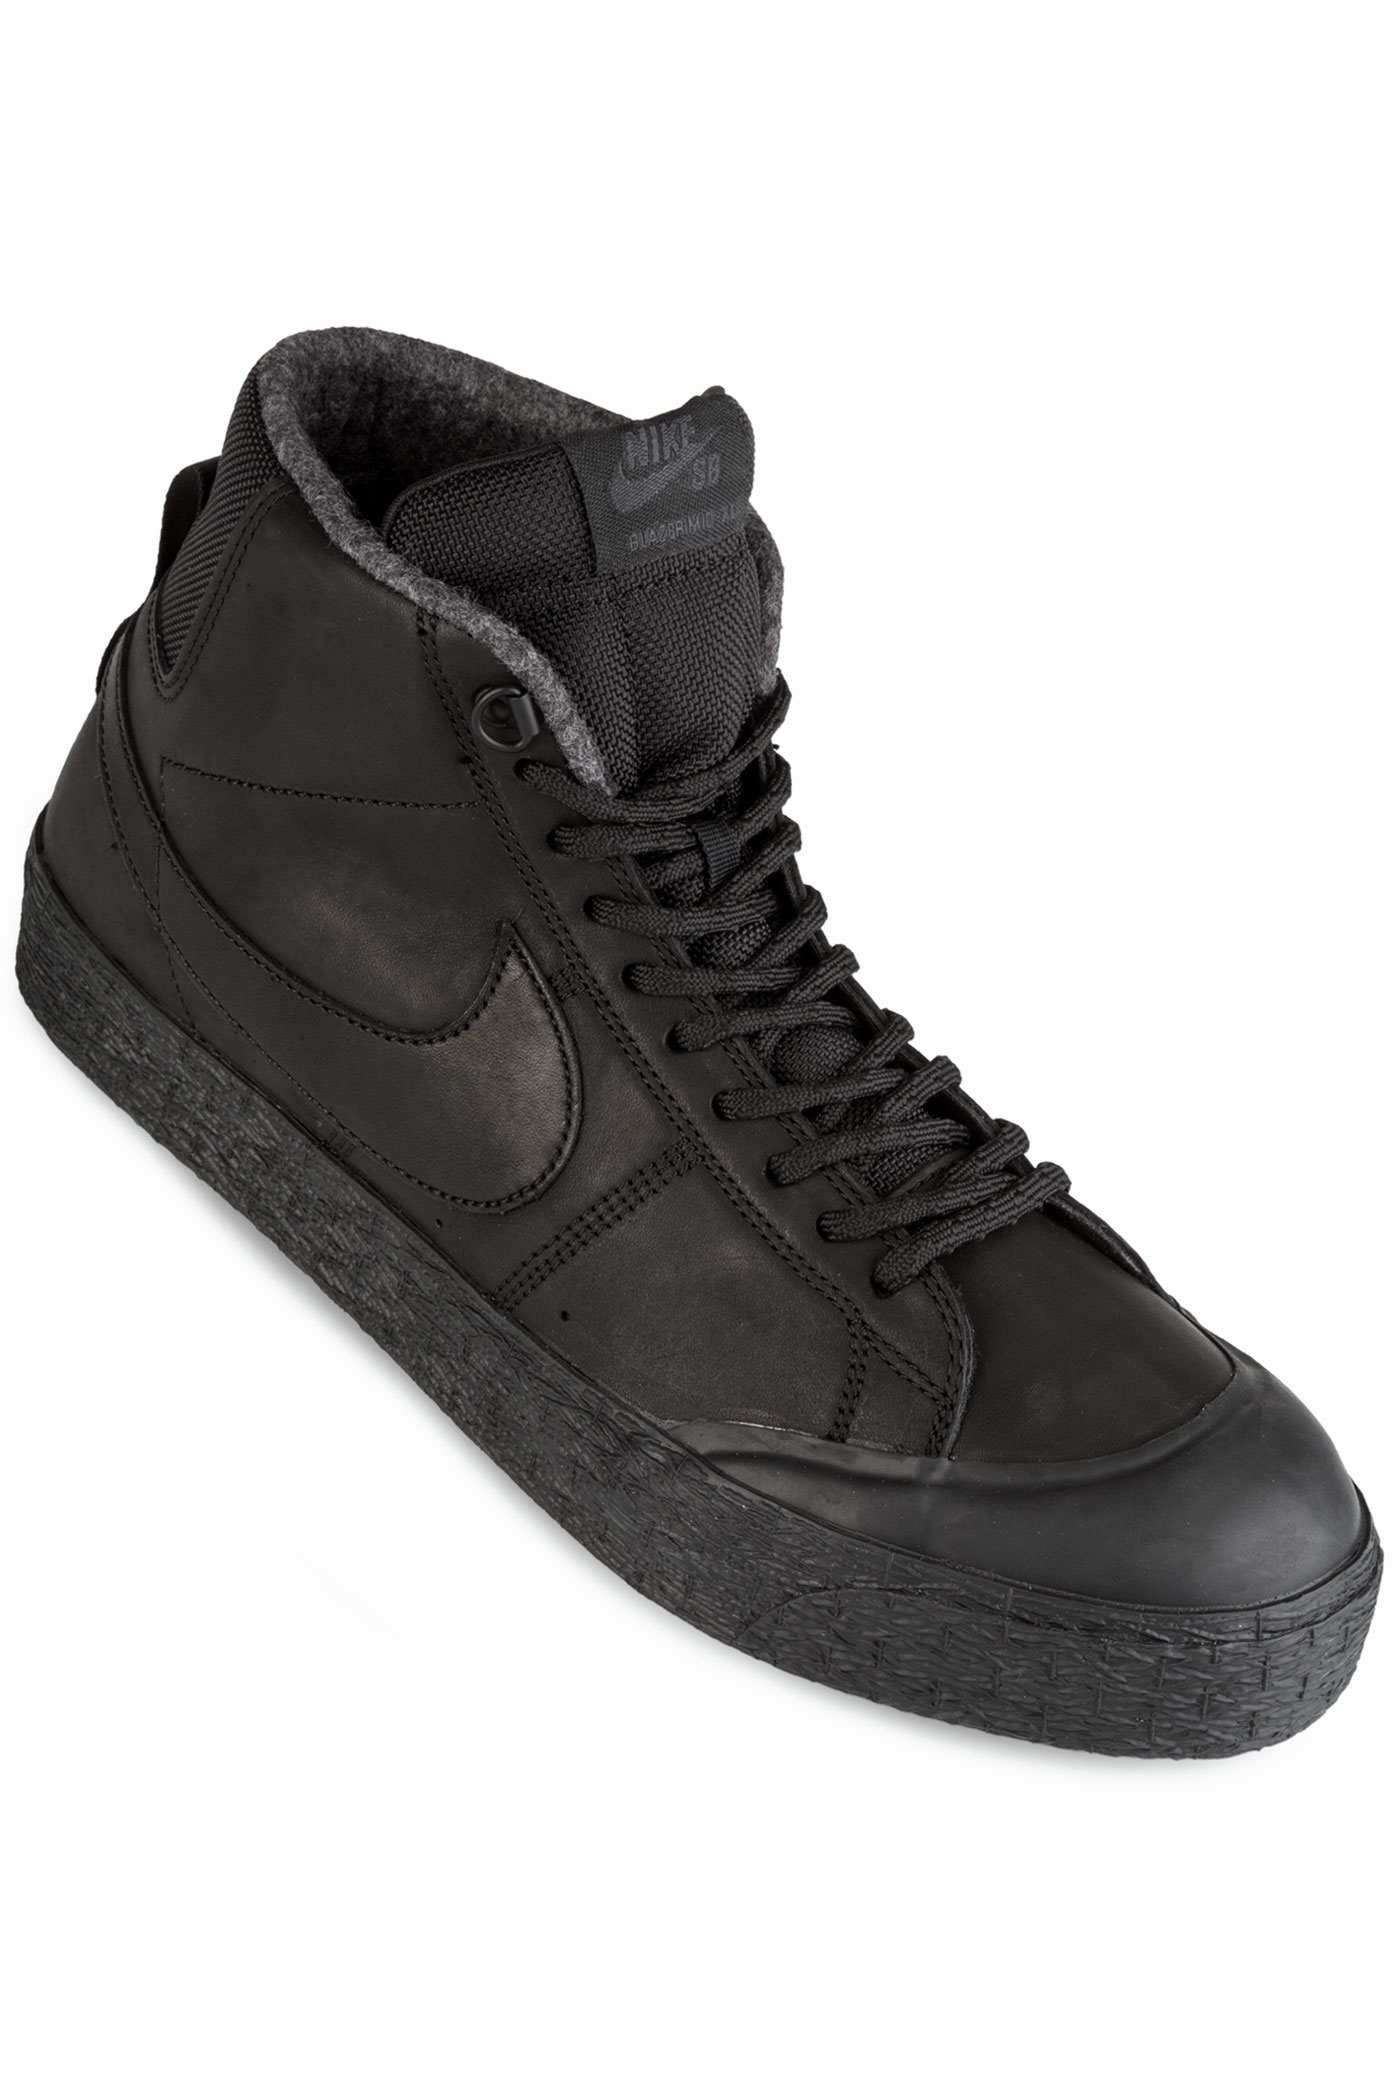 sports shoes deffc ffe43 Nike SB Zoom Blazer Mid XT Bota Shoes (black black anthracite)